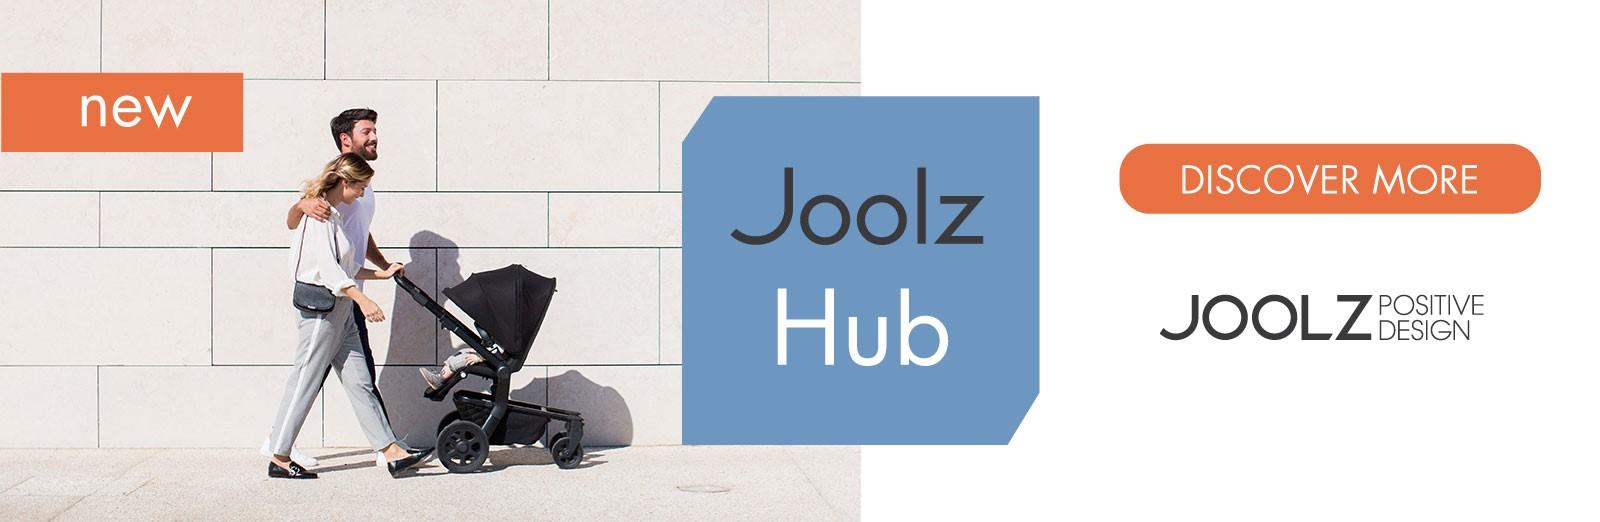 Joolz Car Seat